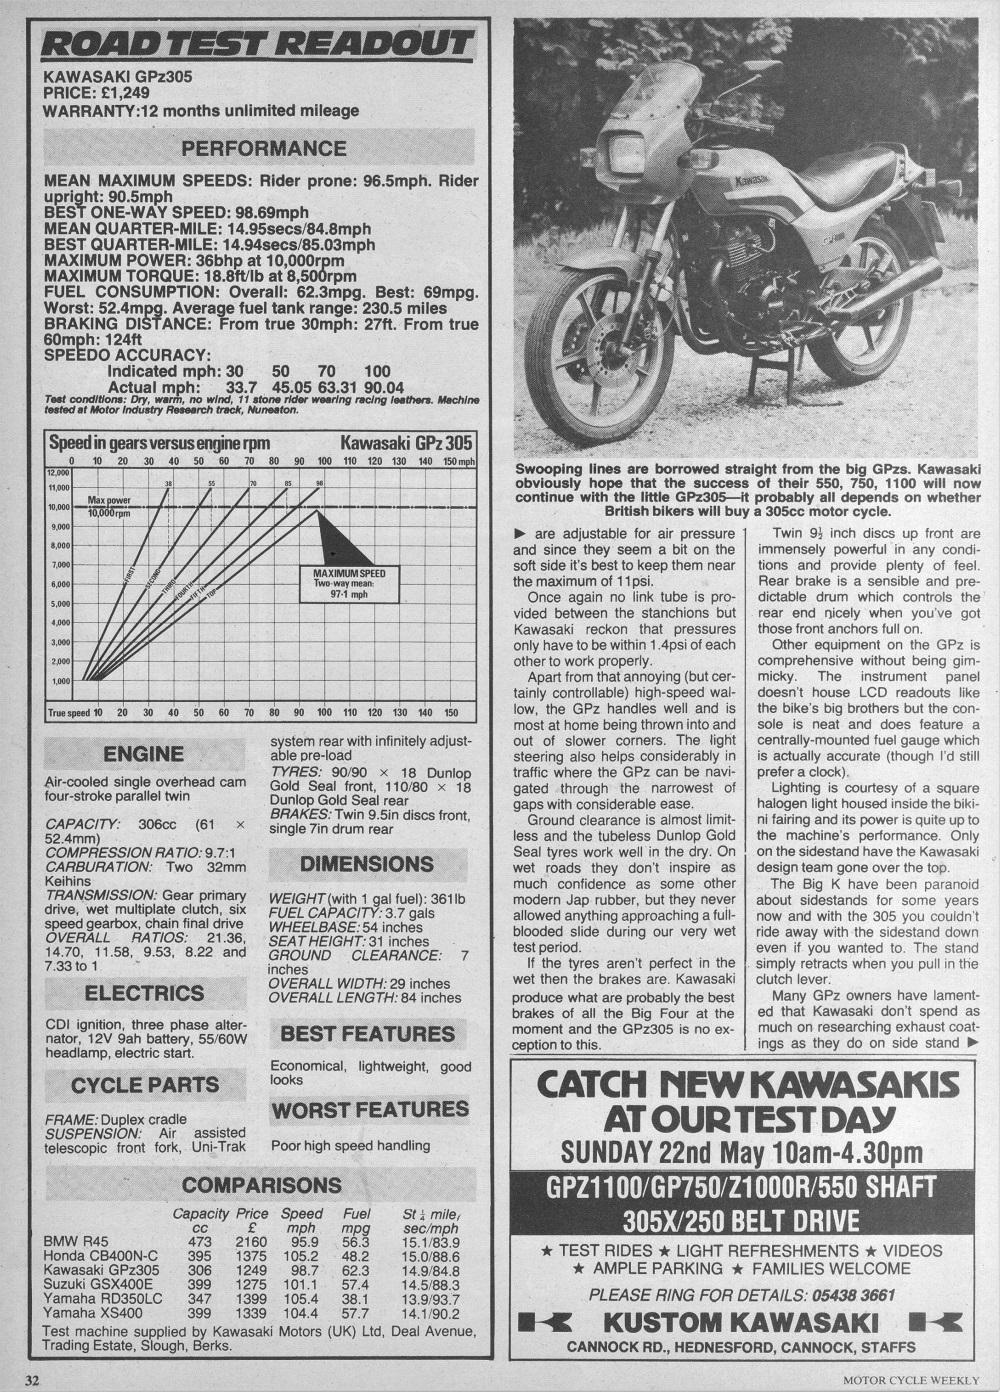 1983 Kawasaki Gpz305 road test.3.jpg